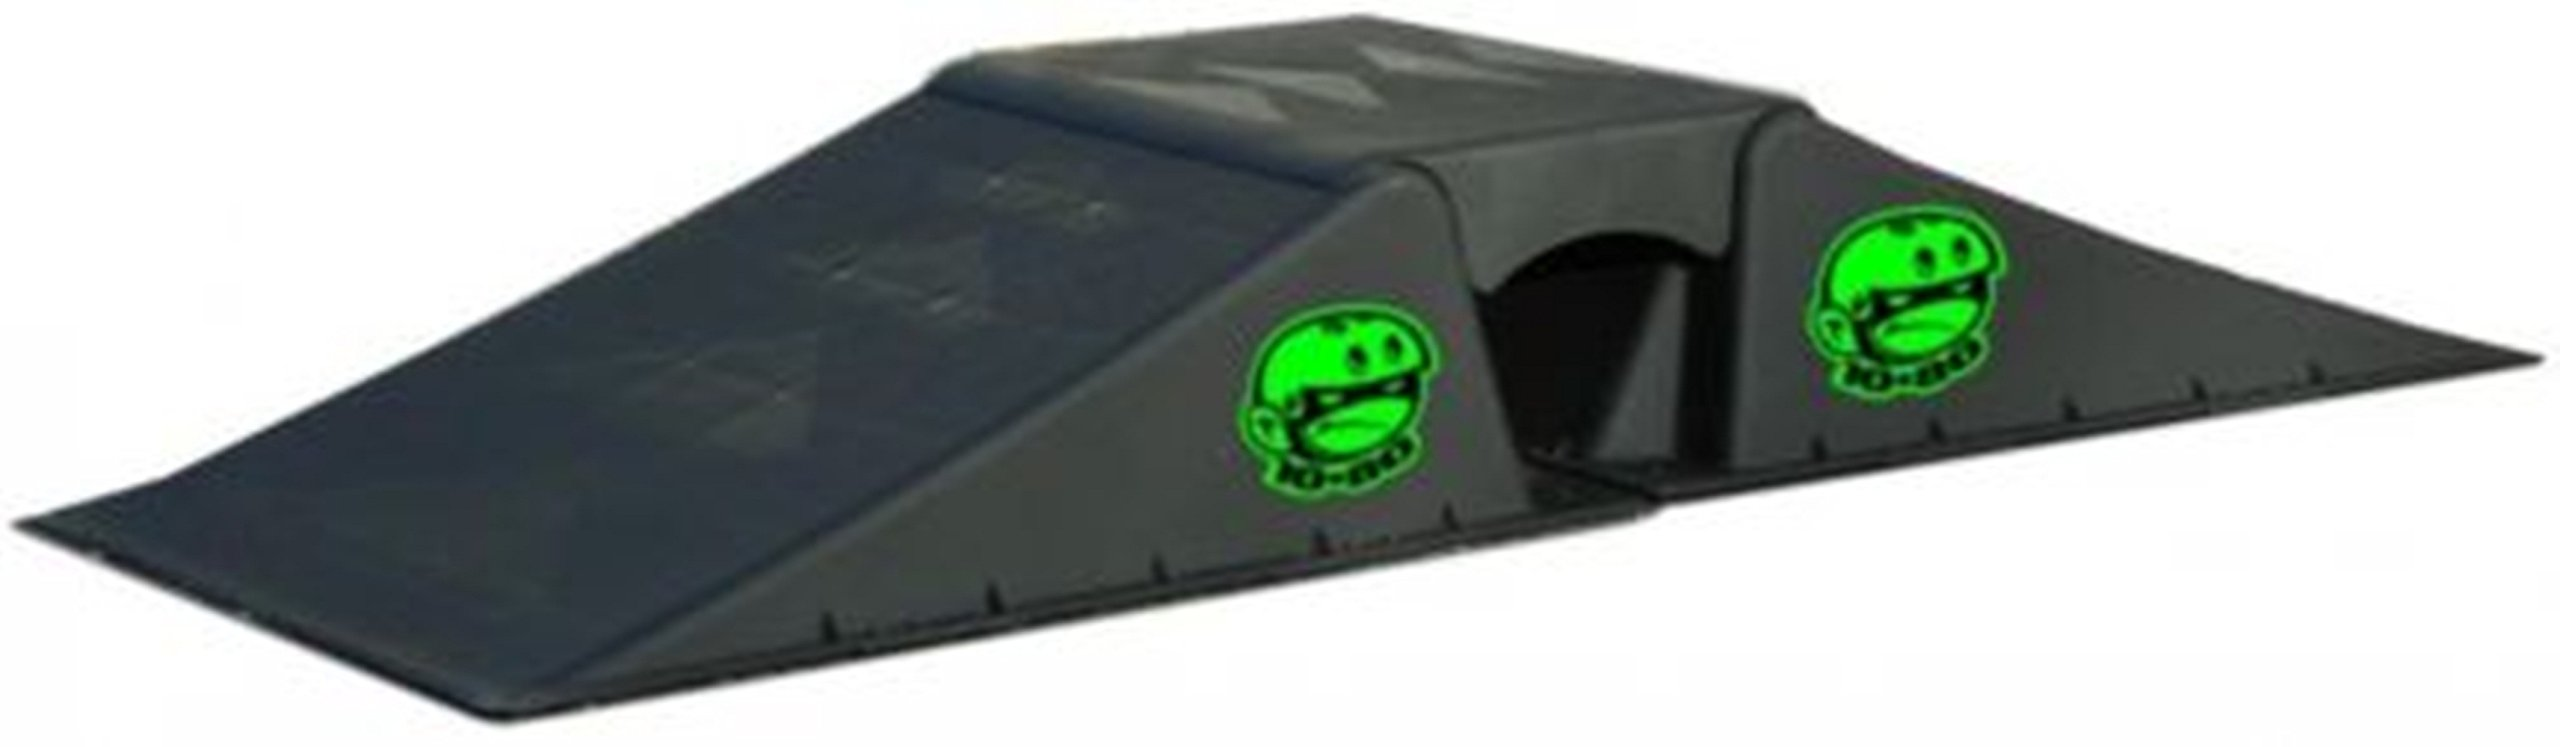 1080 Skate Ramp Jump Skateboard Kids Scooter BMX Park System Inline Boarder by Generic